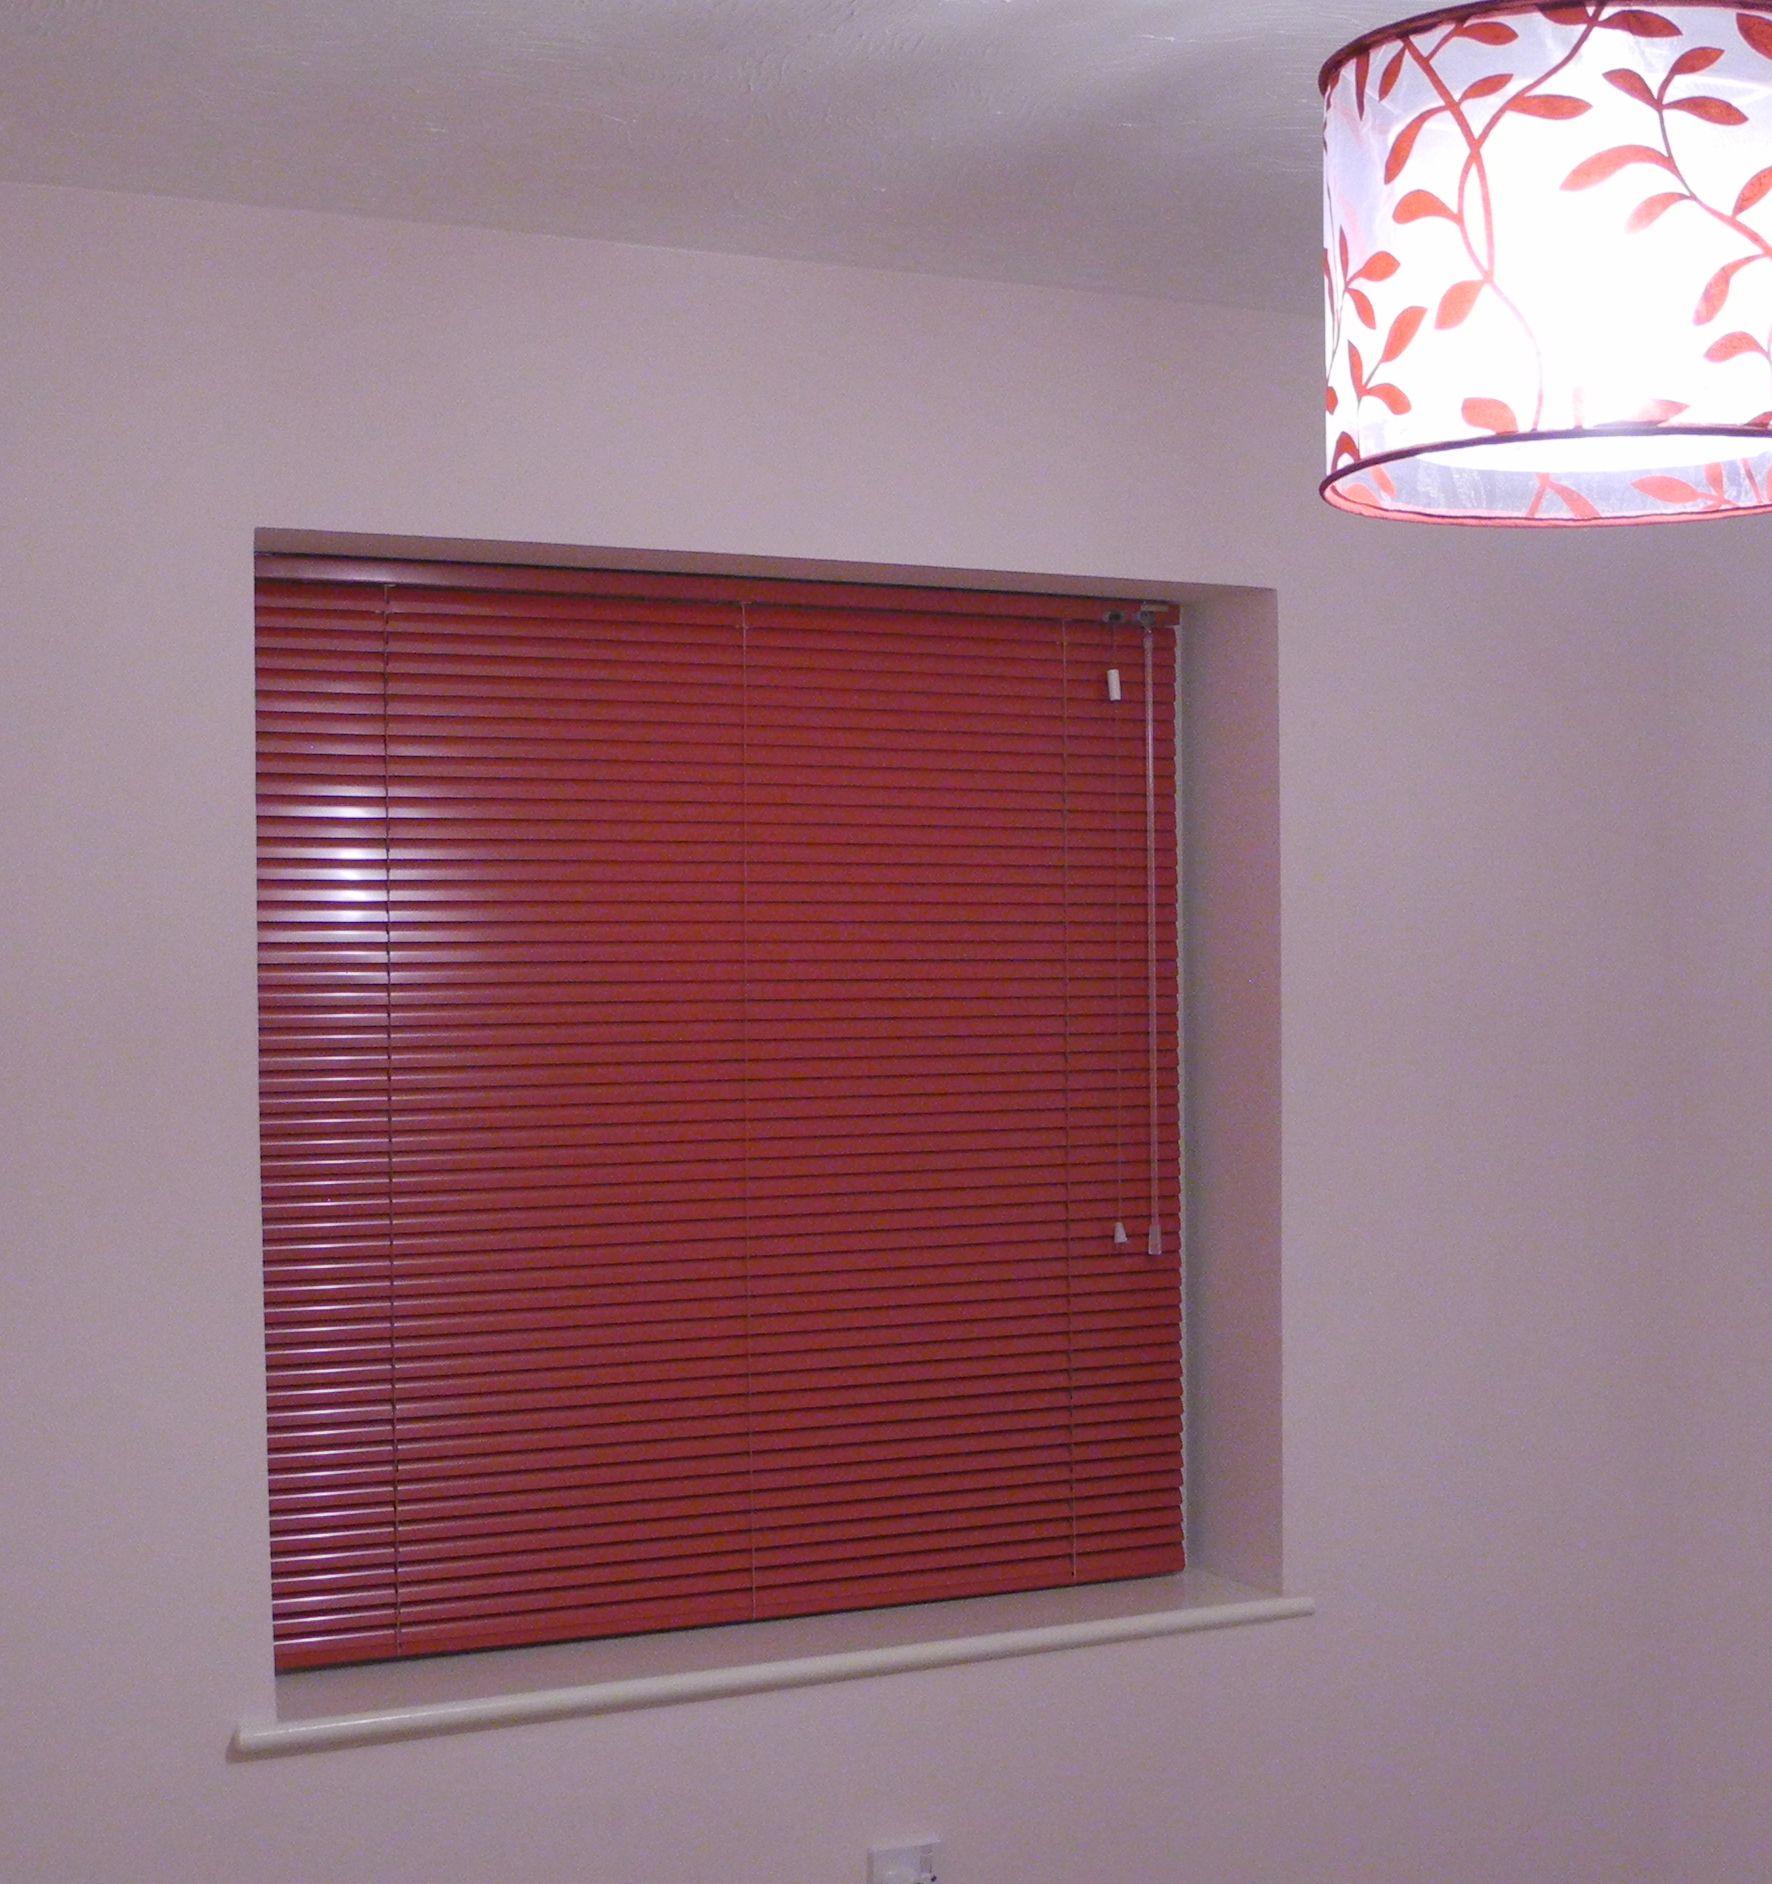 Aluminium venetian blinds color Flieder It looks a few different